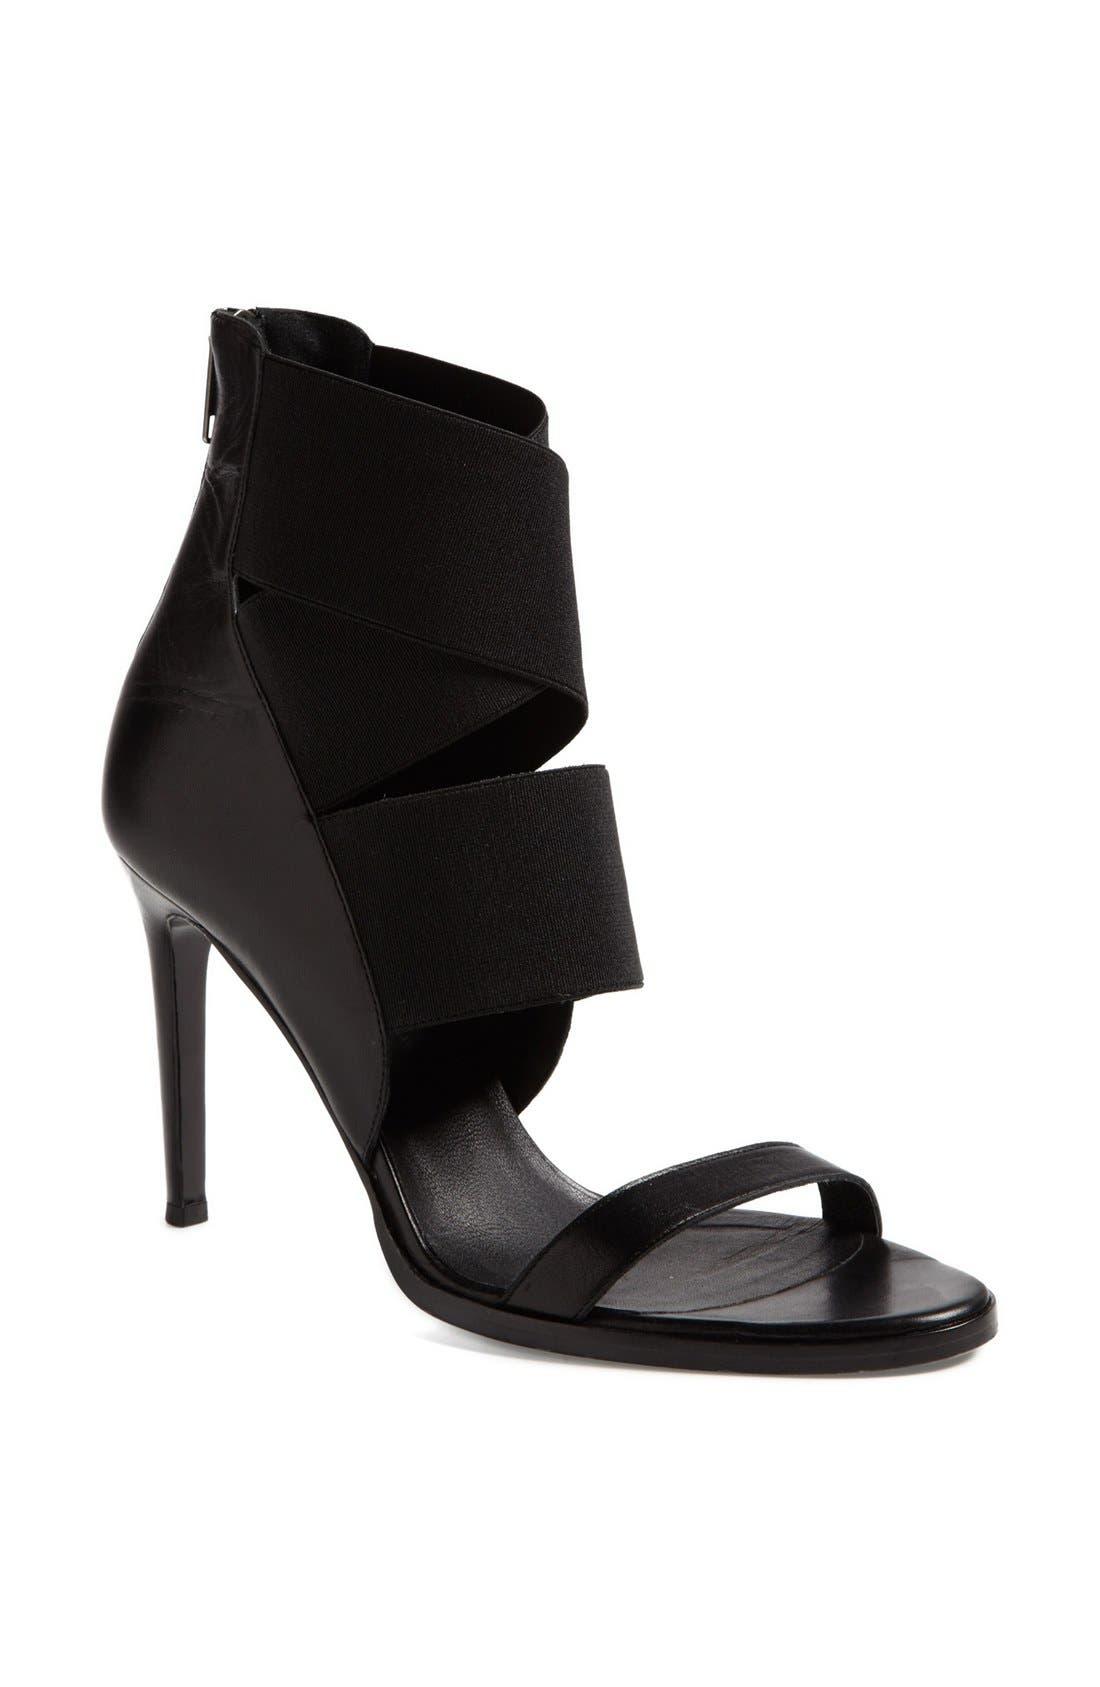 Alternate Image 1 Selected - Helmut Lang 'Silt' Sandal (Online Only)